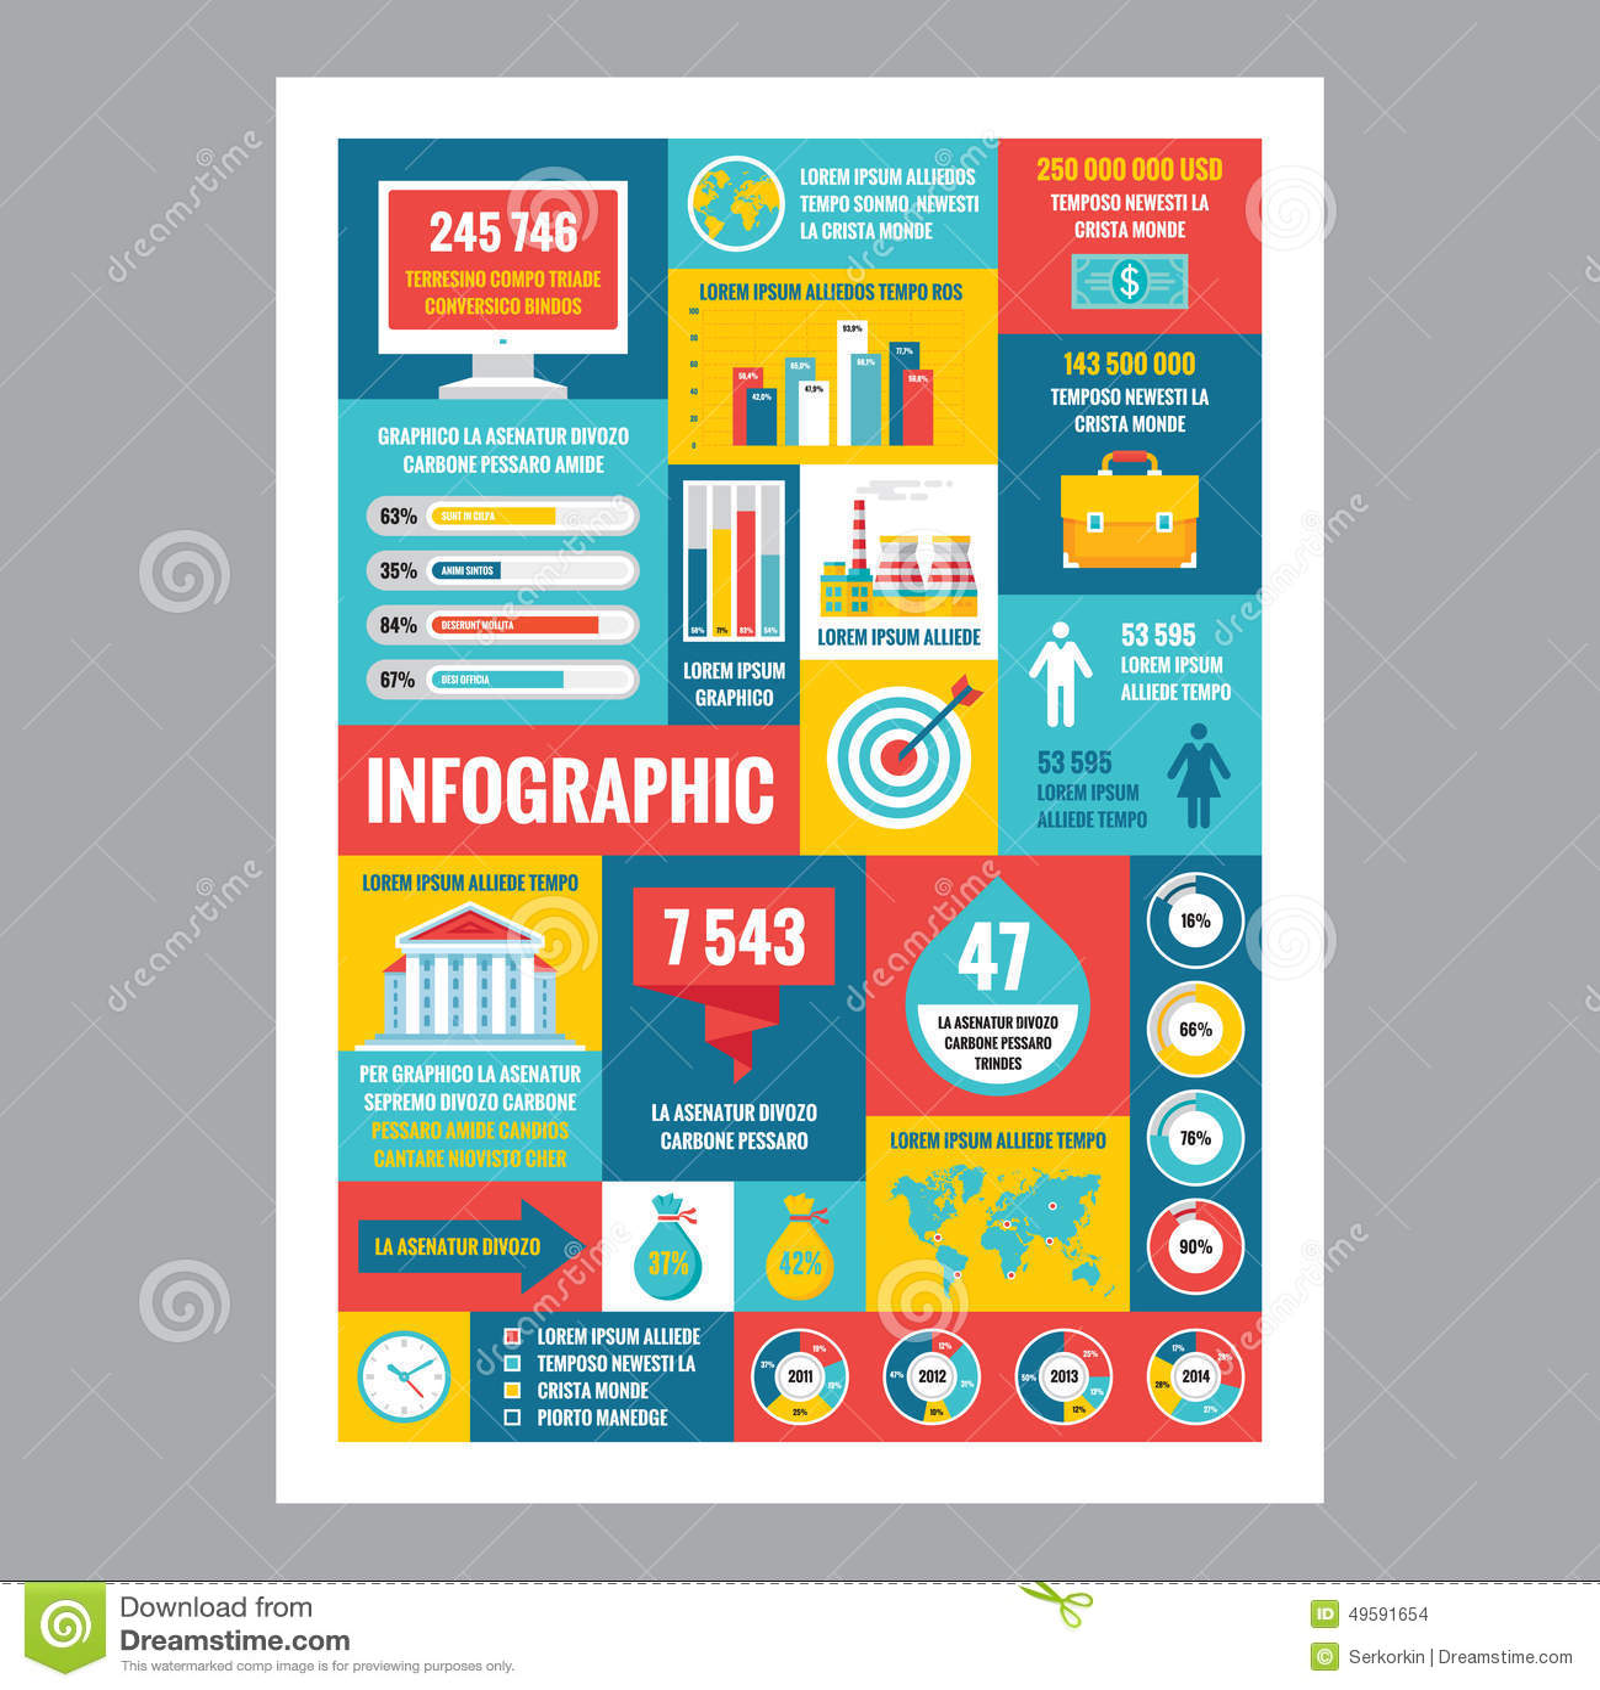 Writingfixya Web Fc2 Com: Business Plan Graphic Design Sample